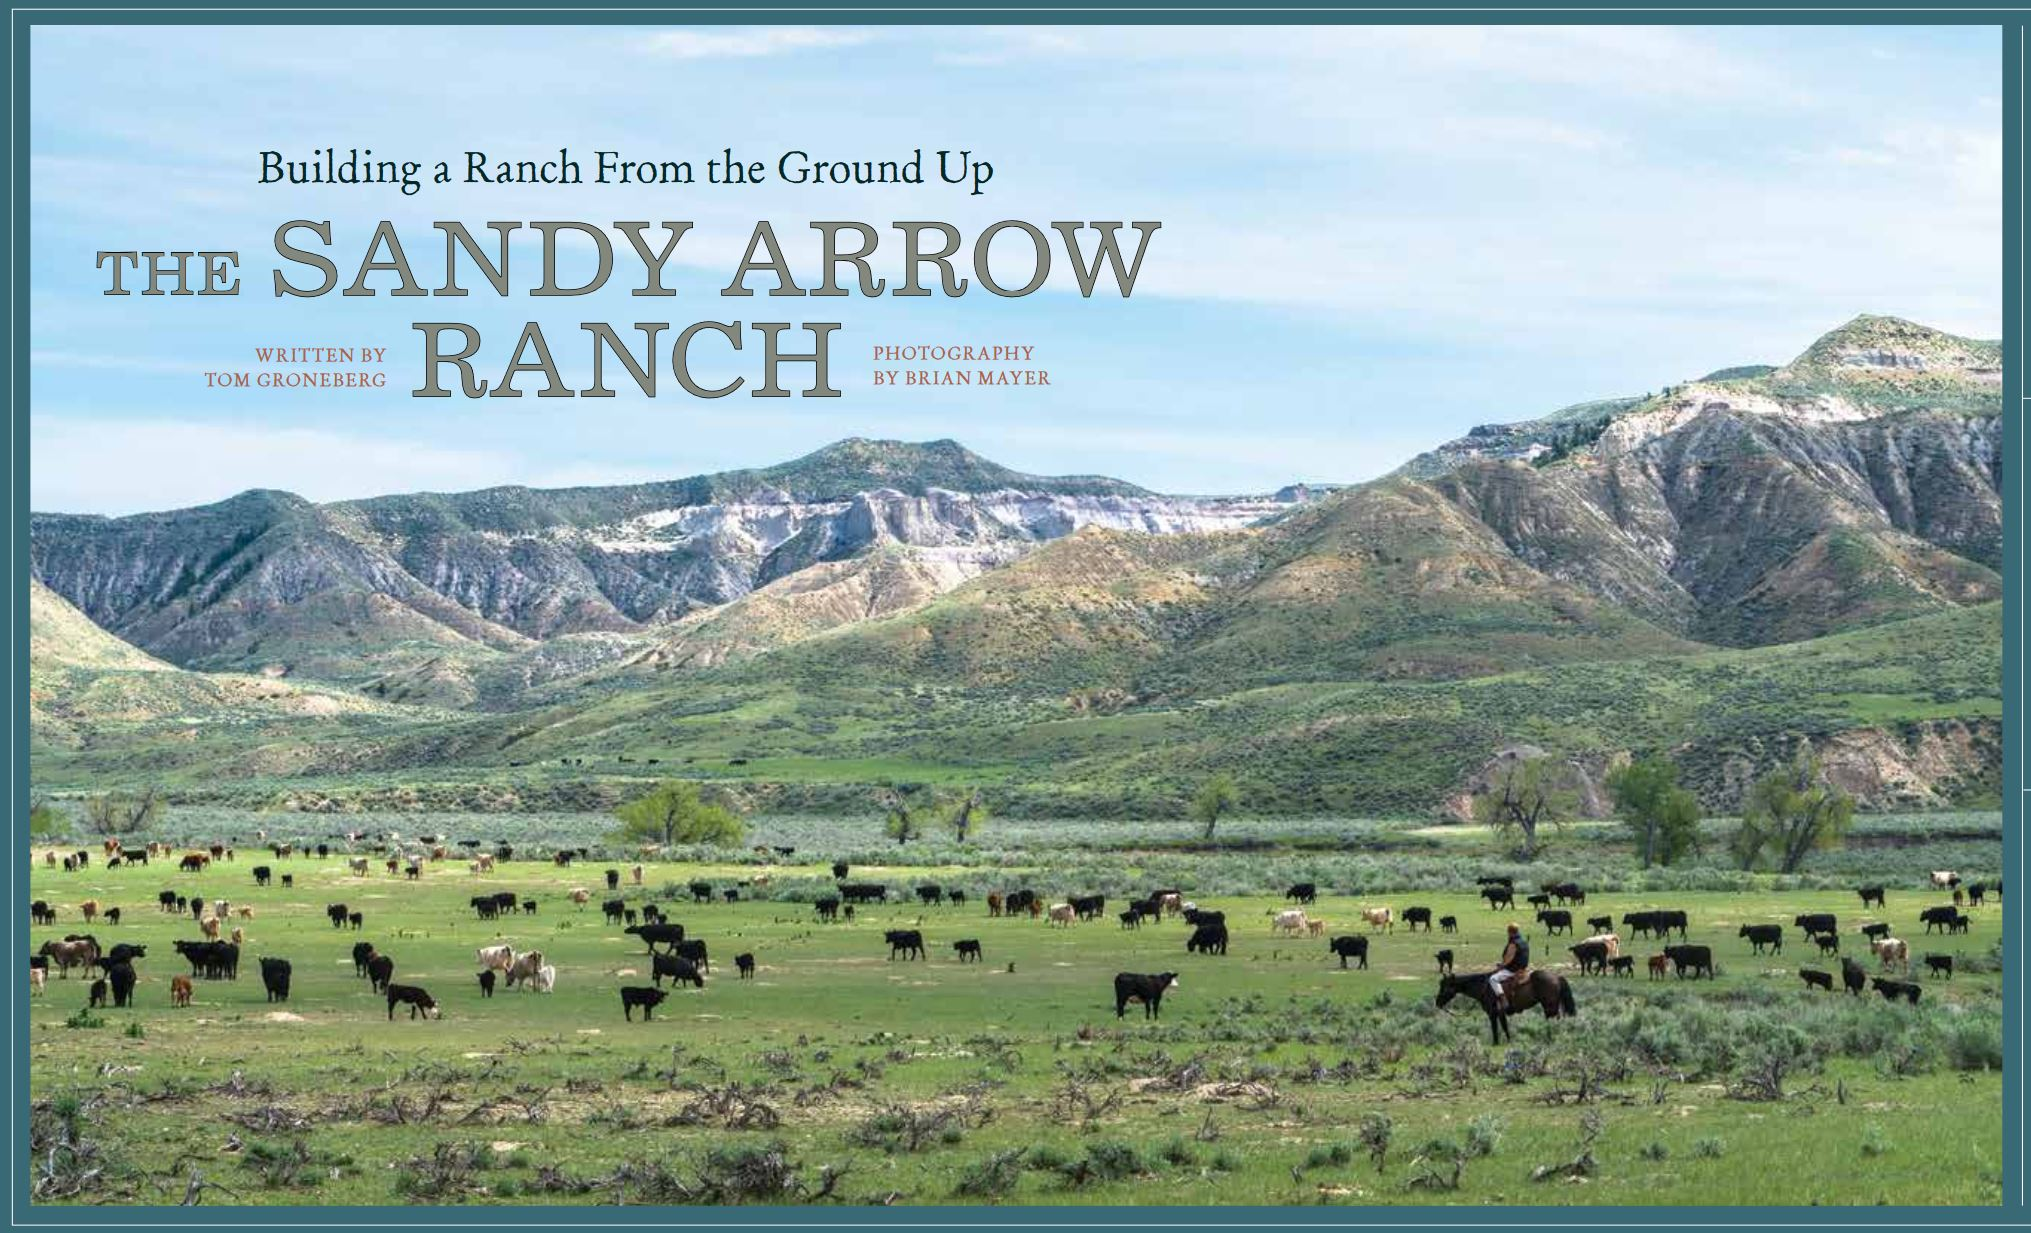 SA Ranch Profile in Big Sky Journal